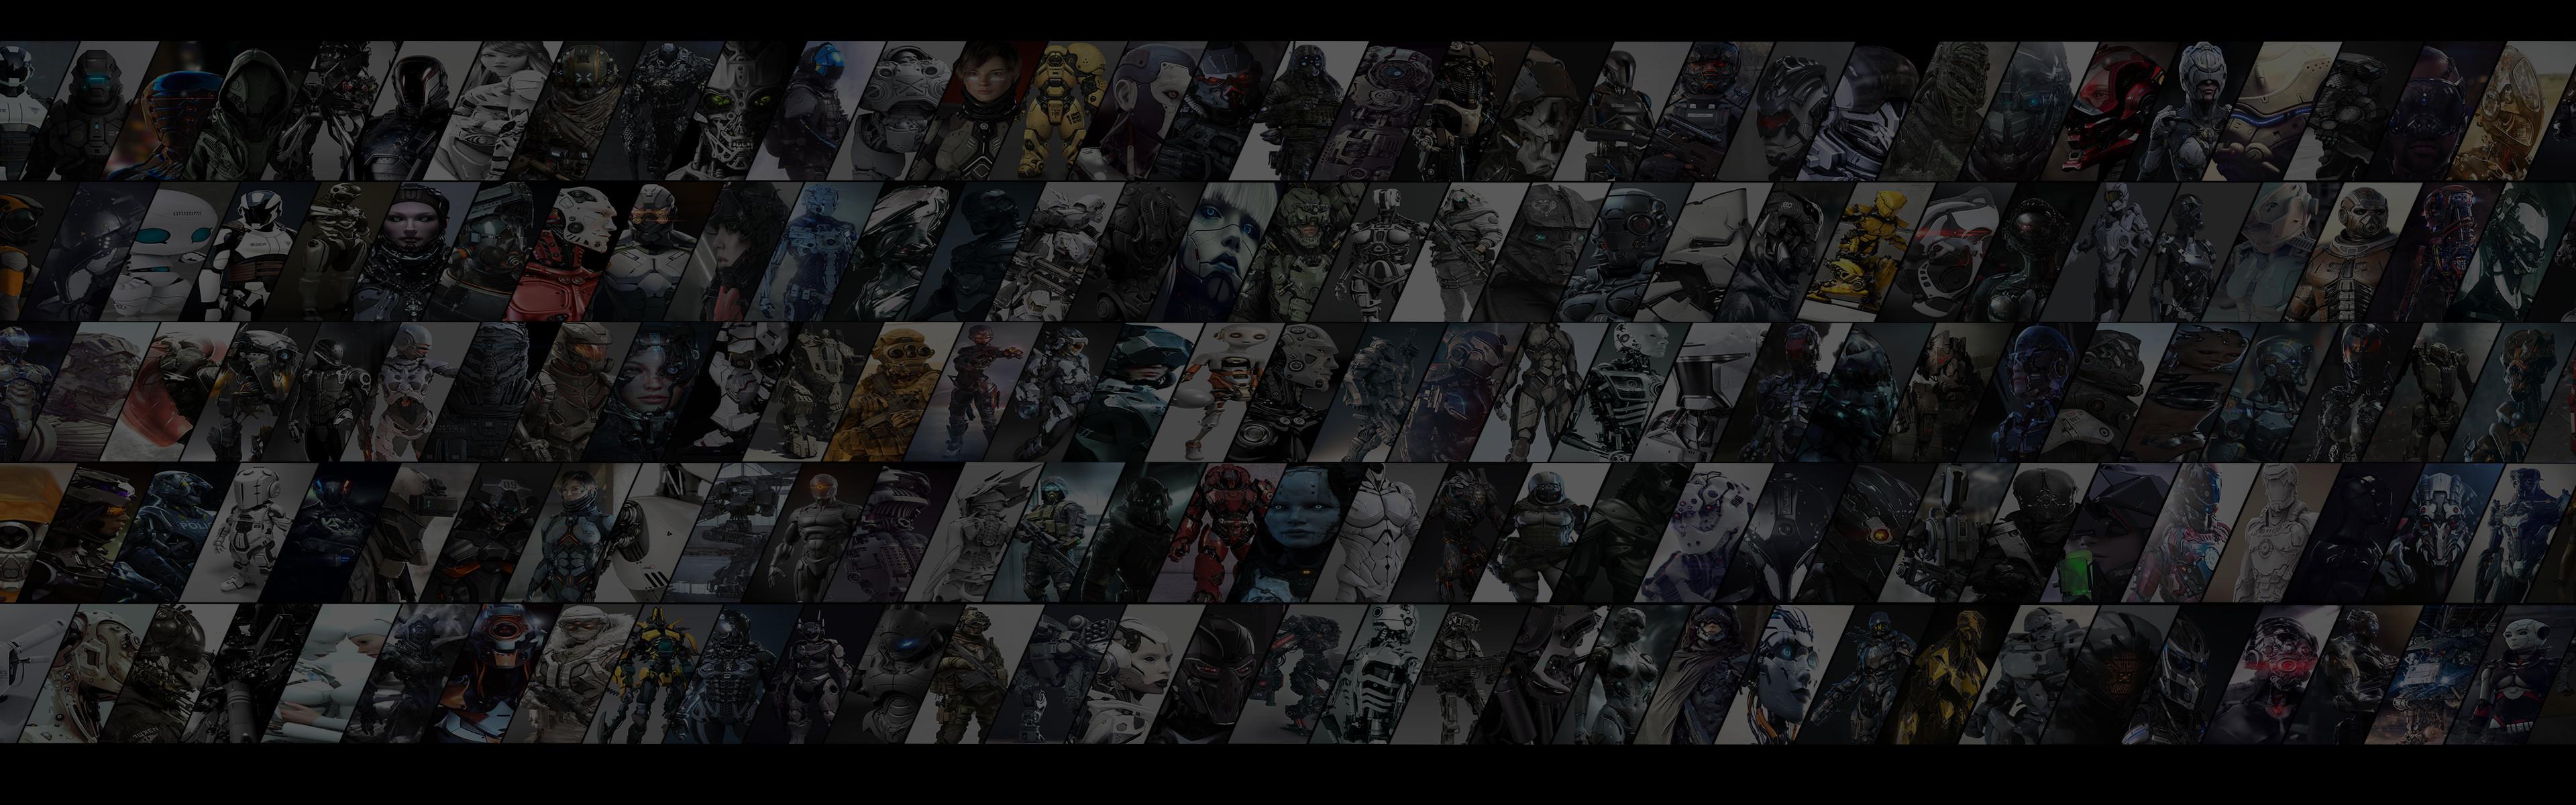 … Dual Monitor 3D Artwork Montage Wallpaper by DarkXess